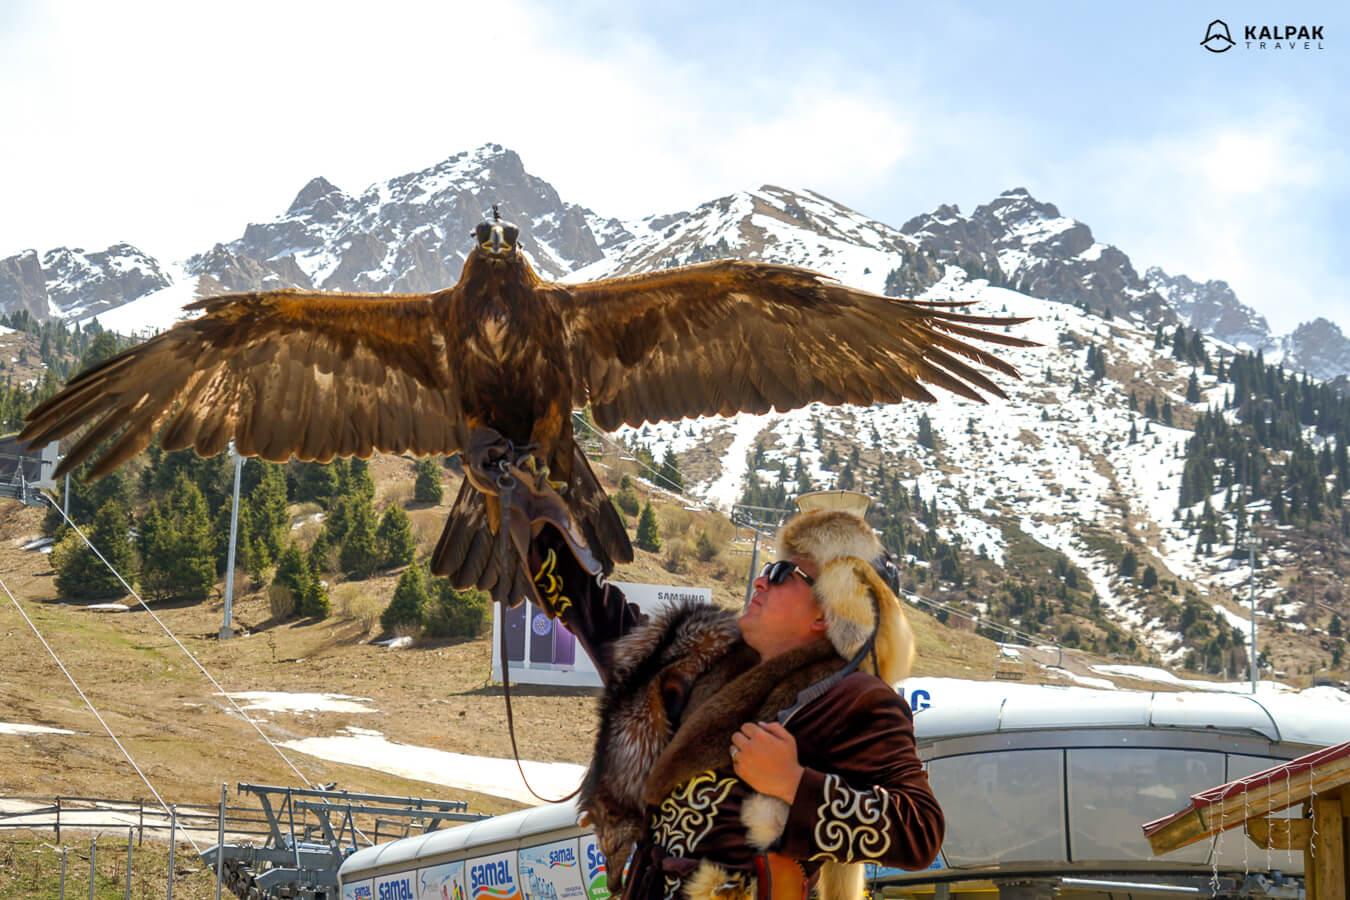 Best of Kazakhstan Tour - Kalpak Travel